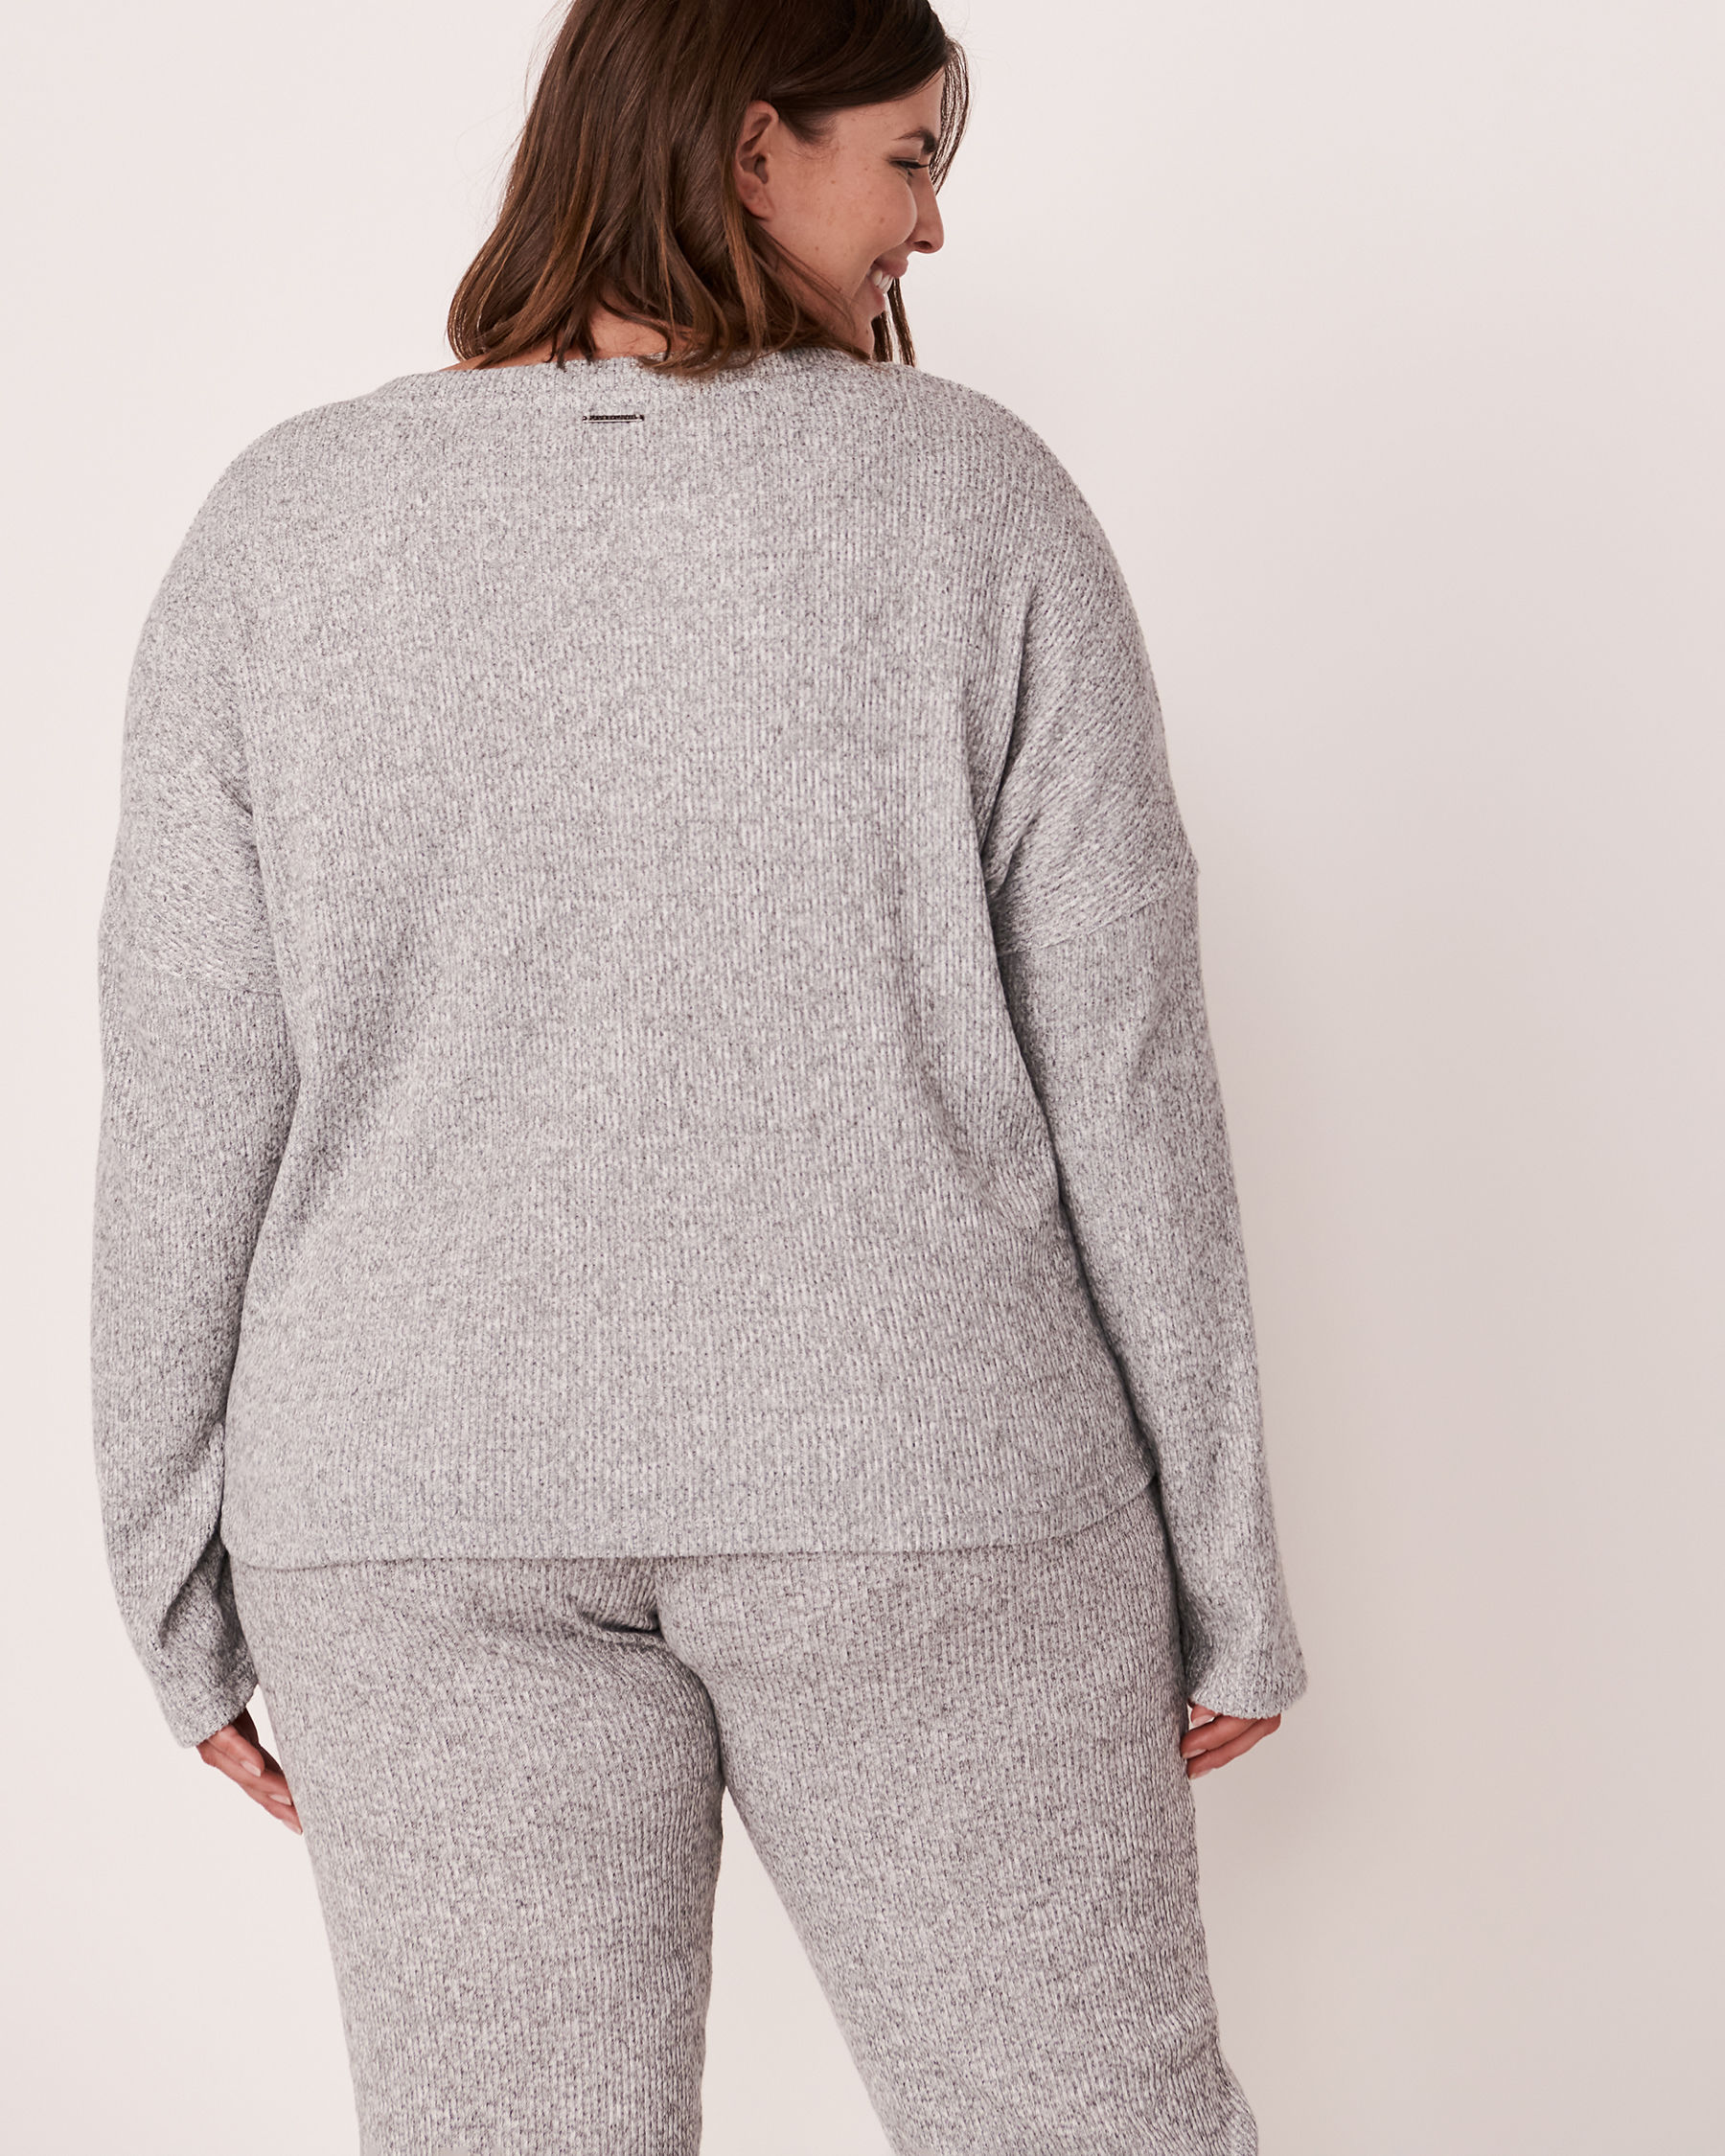 LA VIE EN ROSE Ribbed Long Sleeve Shirt Grey 50100015 - View2